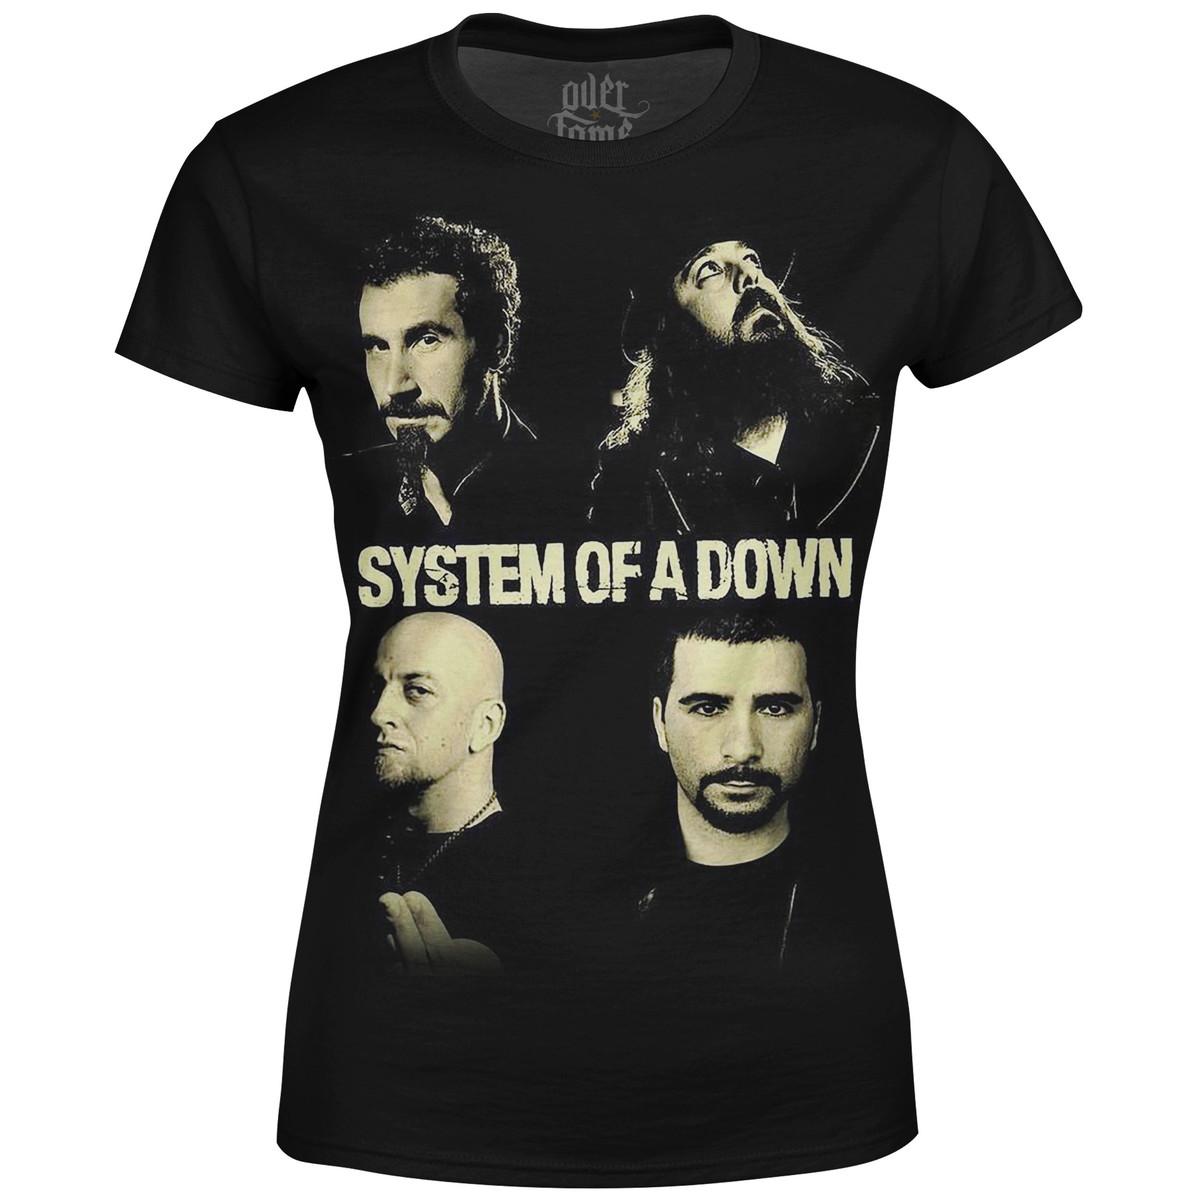 6b43b9a052 Camiseta Baby Look Feminina System of a Down md01 no Elo7